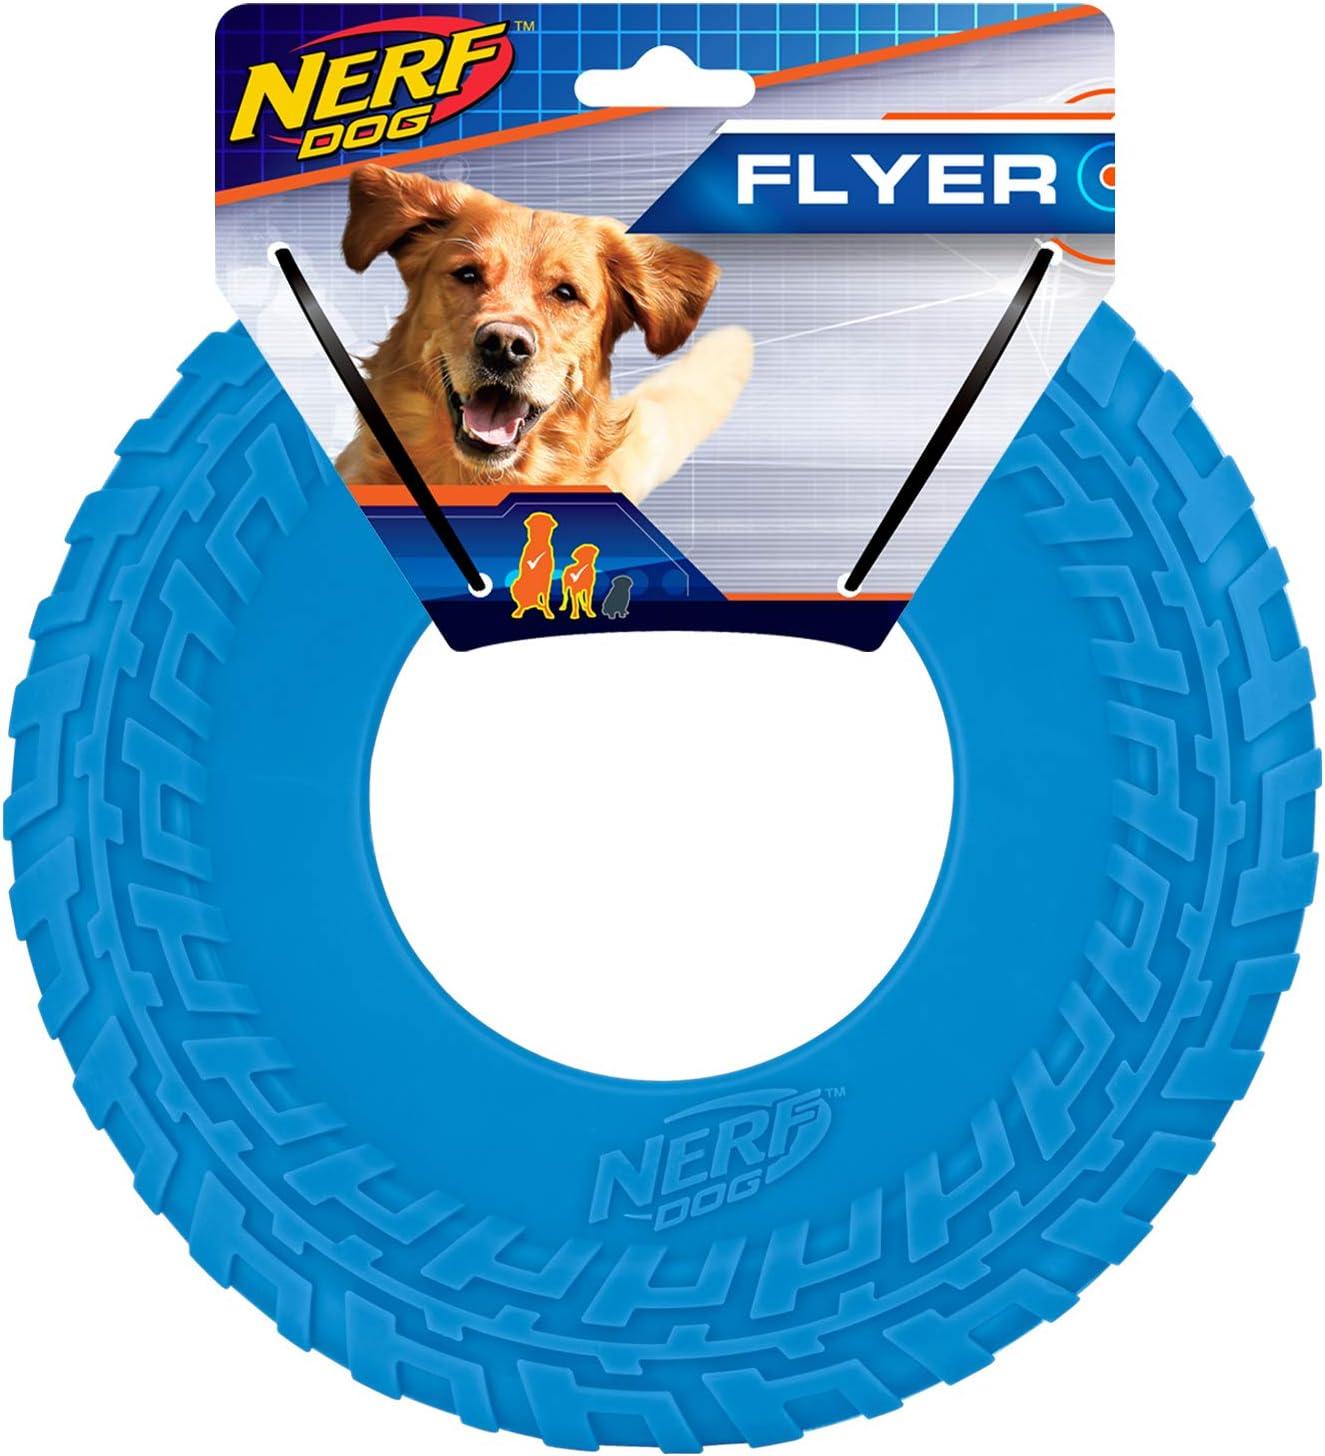 Nerf Dog Flyer security Atomic Sacramento Mall